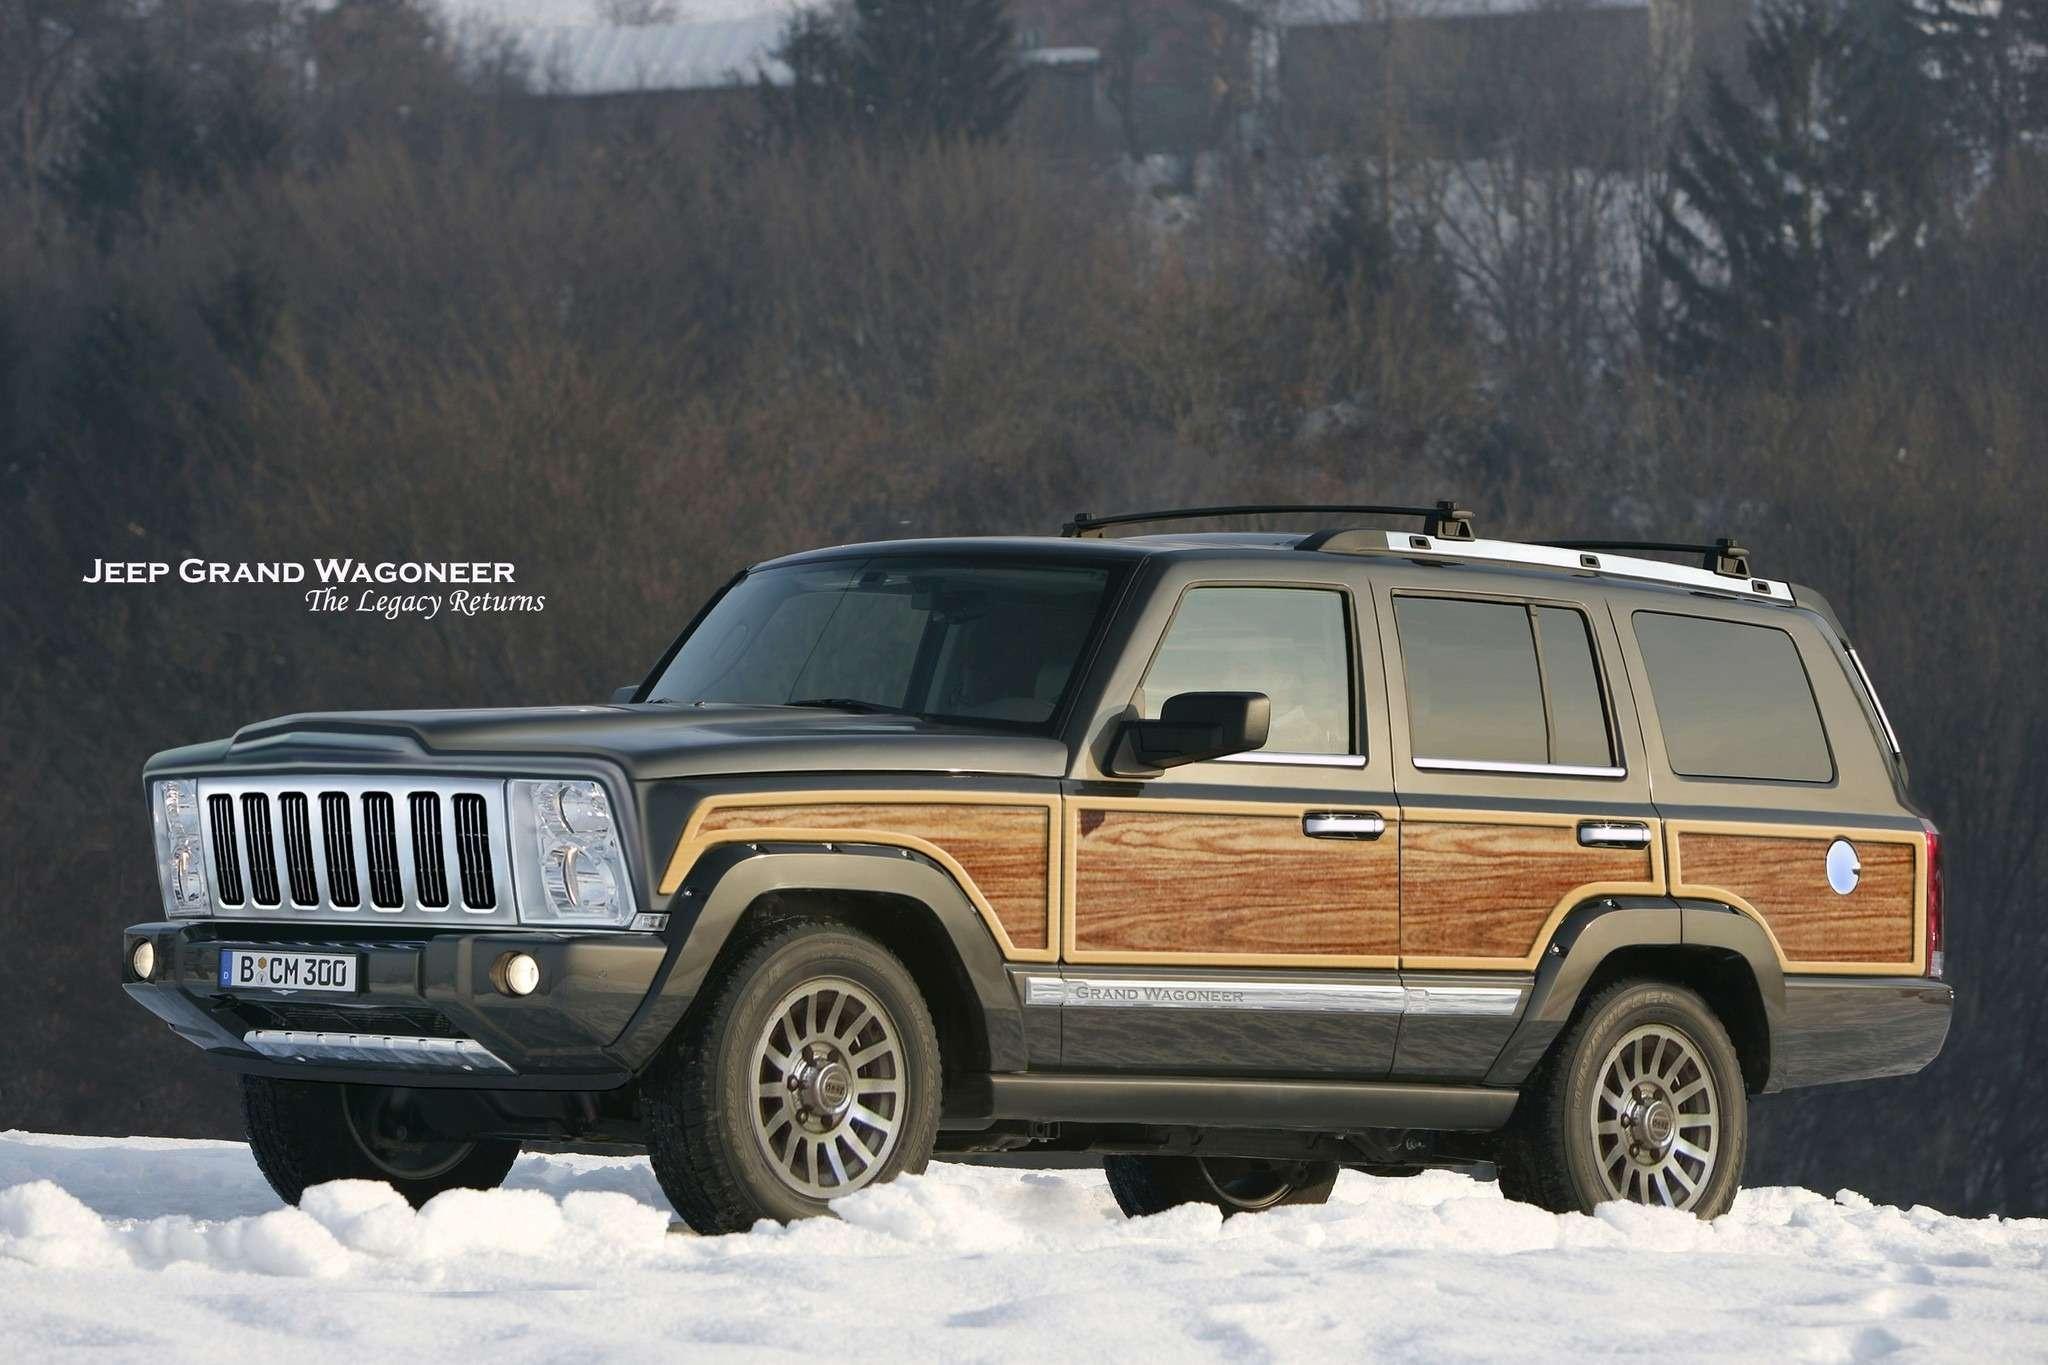 jeep-grand-wagoneer-01asd